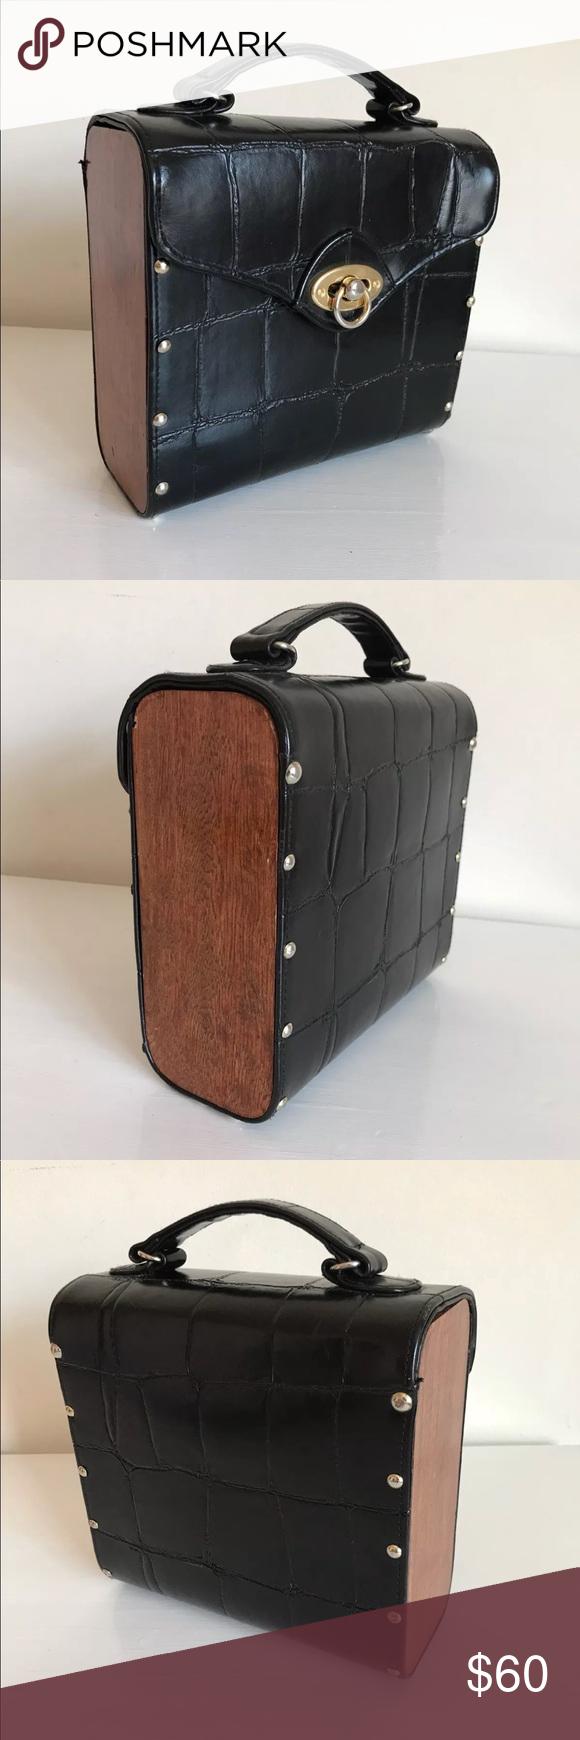 Vintage Black Gold   Wood Box Bag Clutch 1970s 80s Vintage Black Leather  Crocodile Wooden Box f75b7adeda